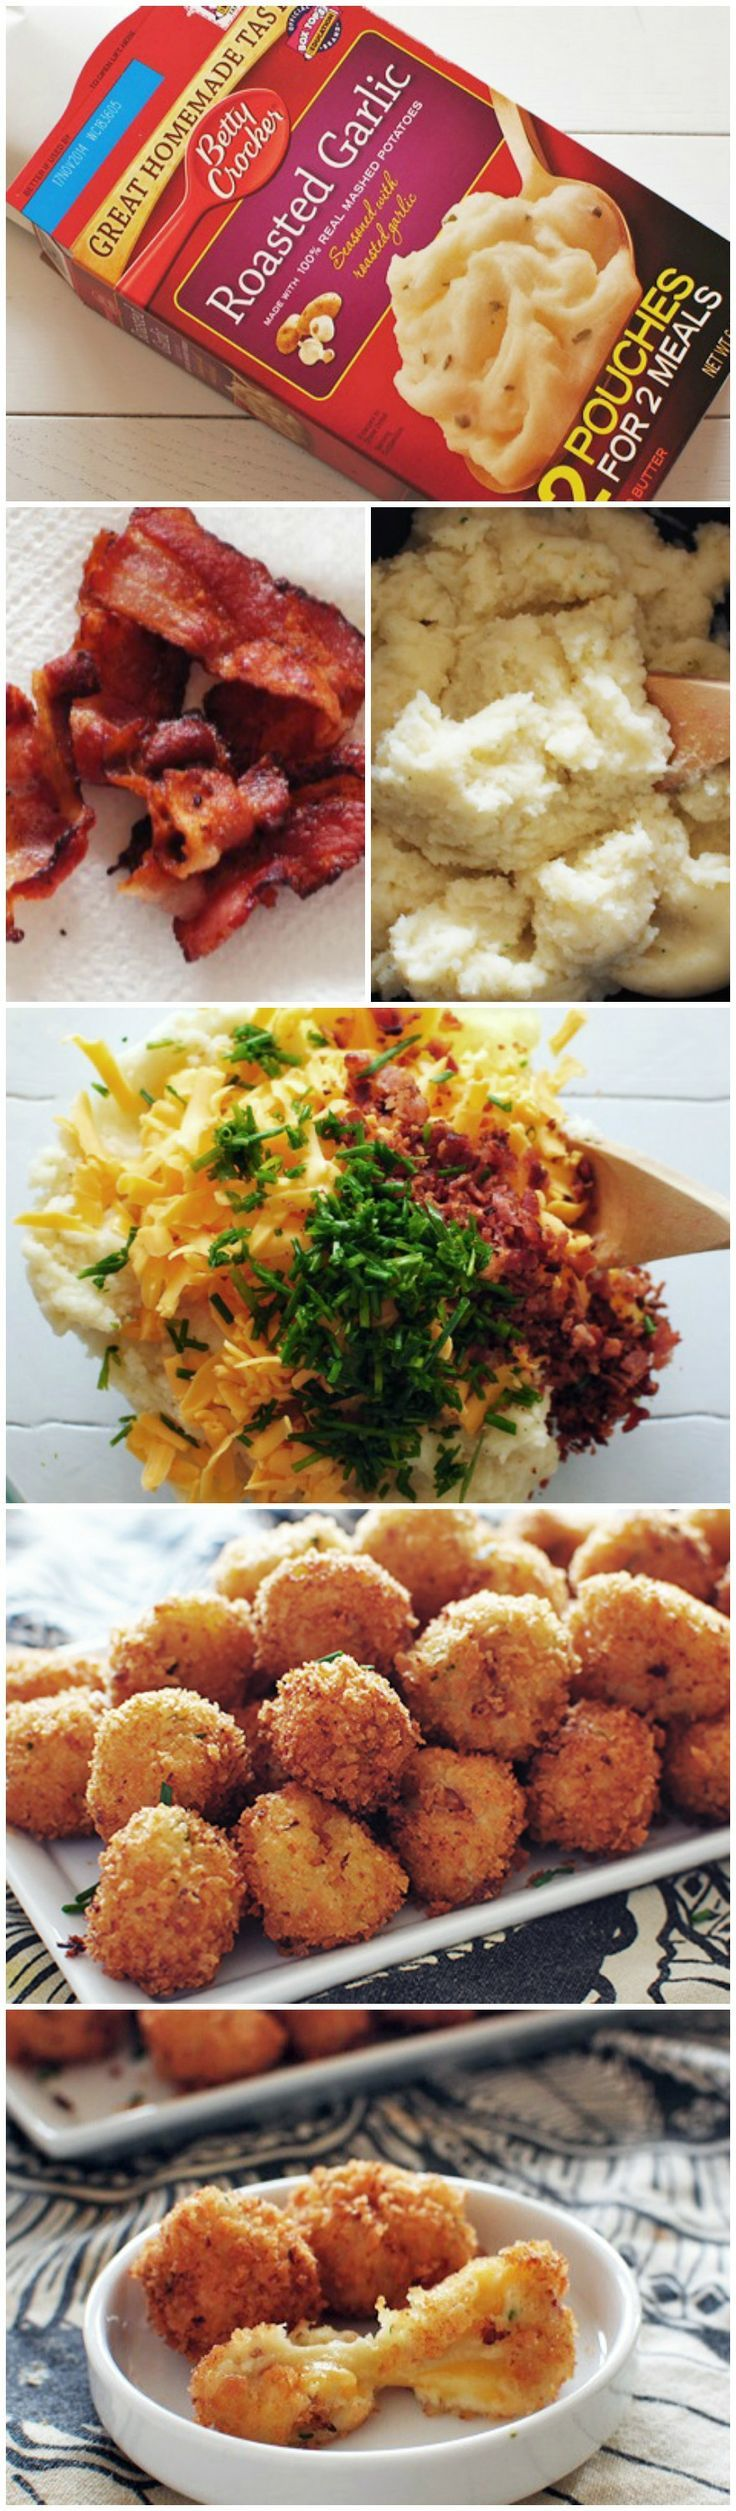 Loaded Cheesy Mashed Potato Balls                                                                                                                                                                                 More